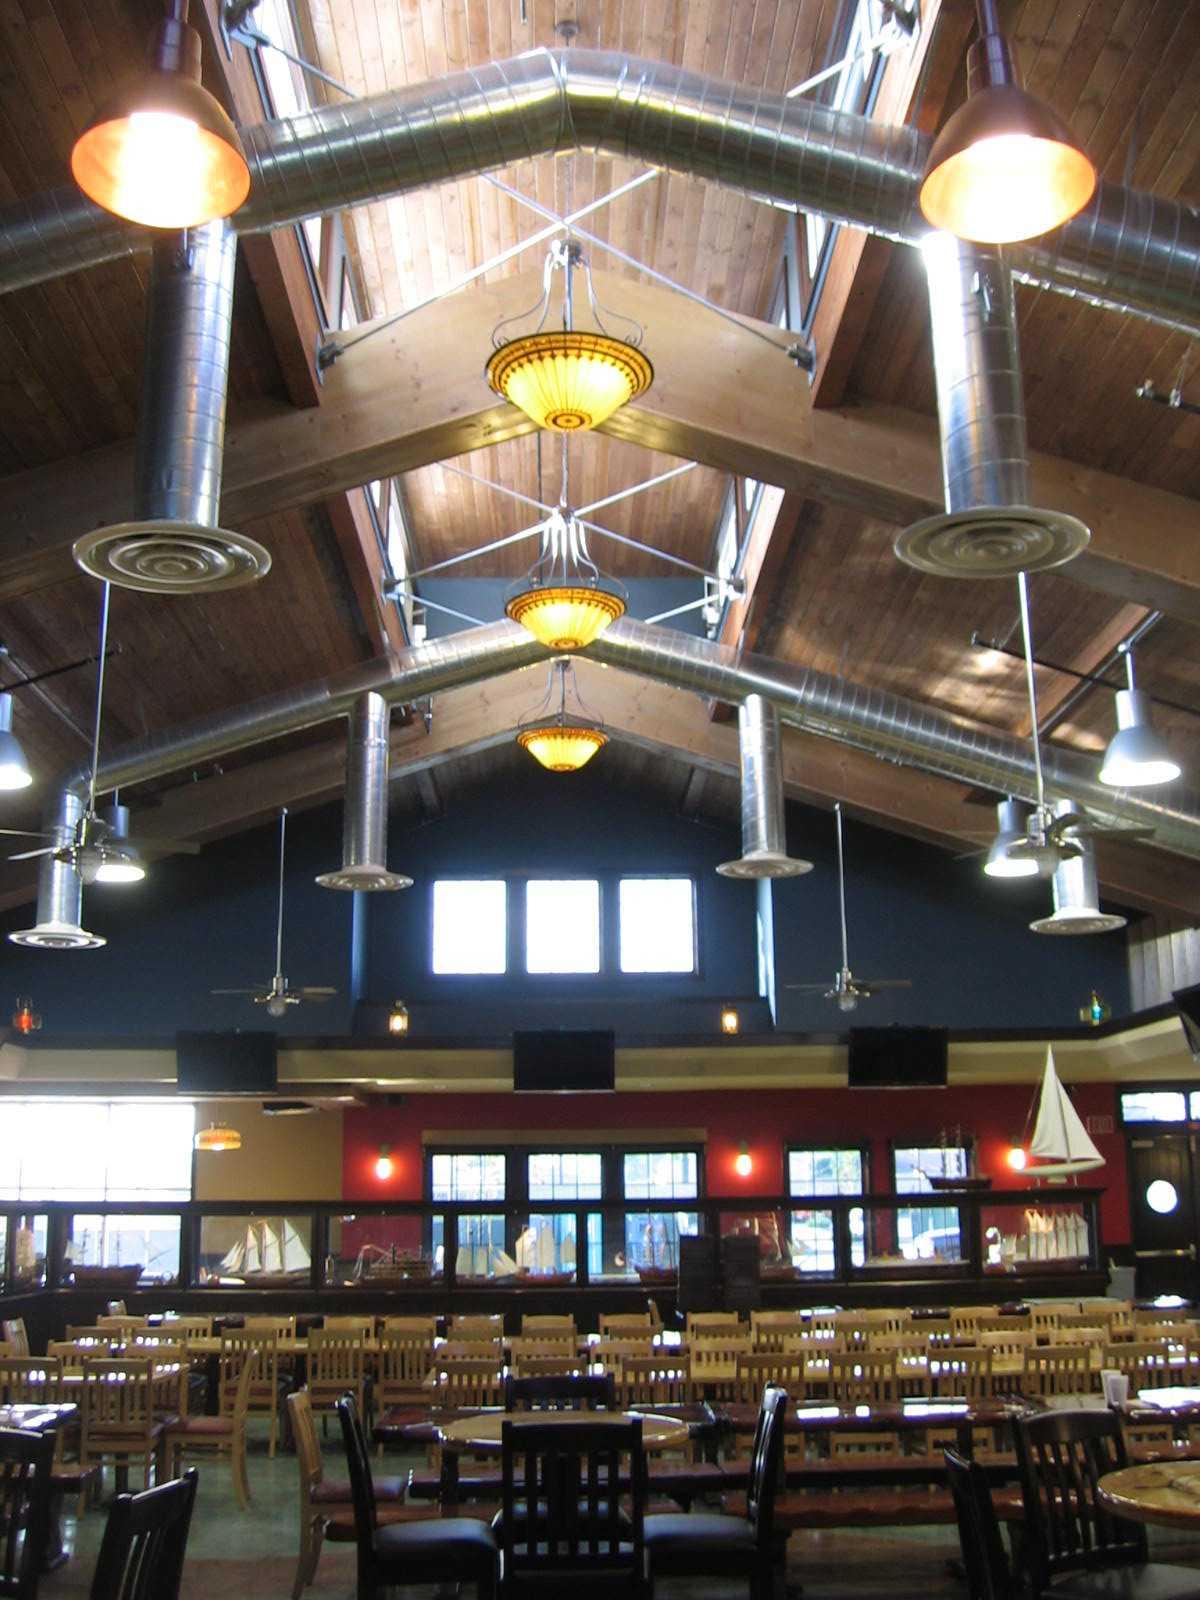 Clearman's Galley Restaurant, San Gabriel